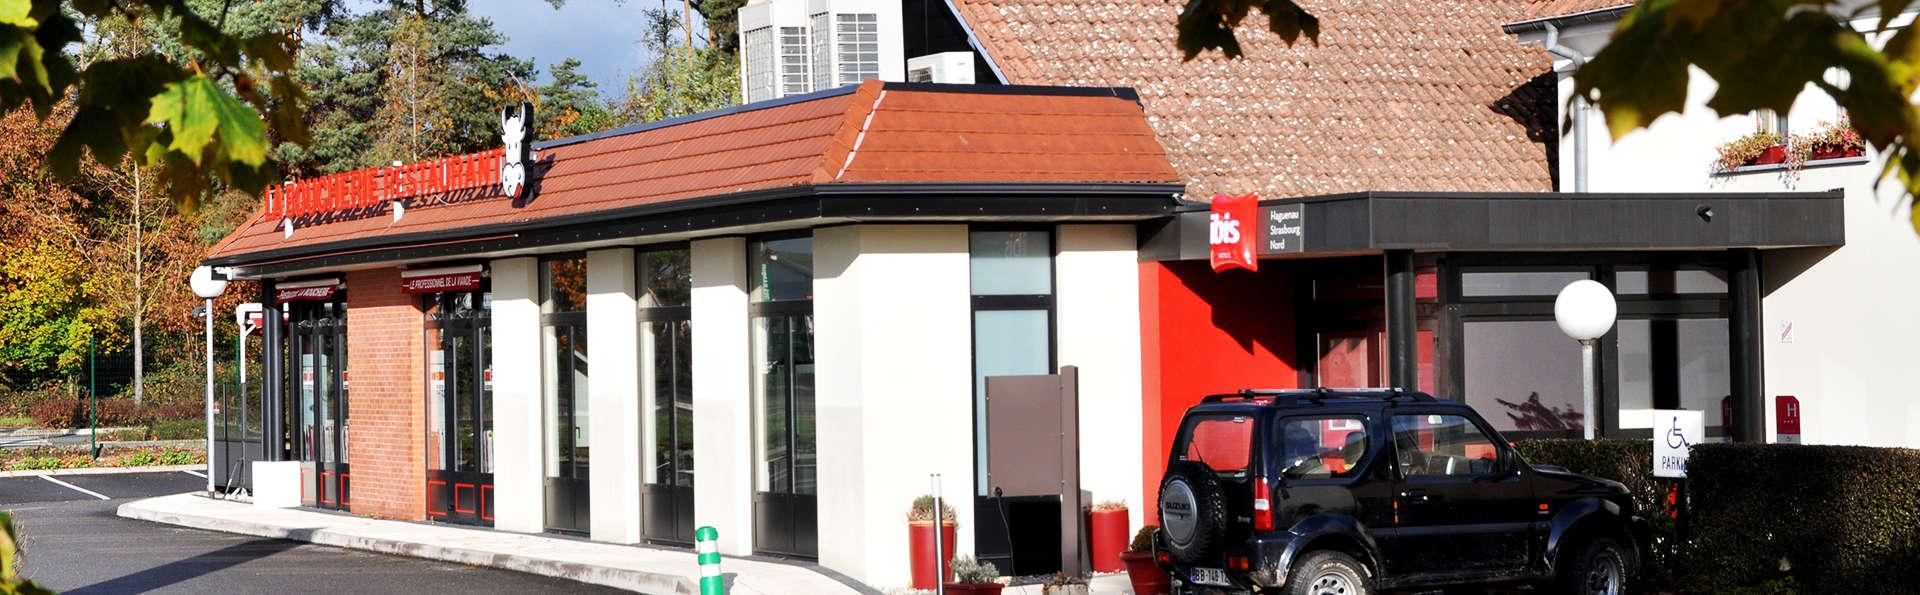 Ibis Haguenau Strasbourg Nord - EDIT_front1.jpg